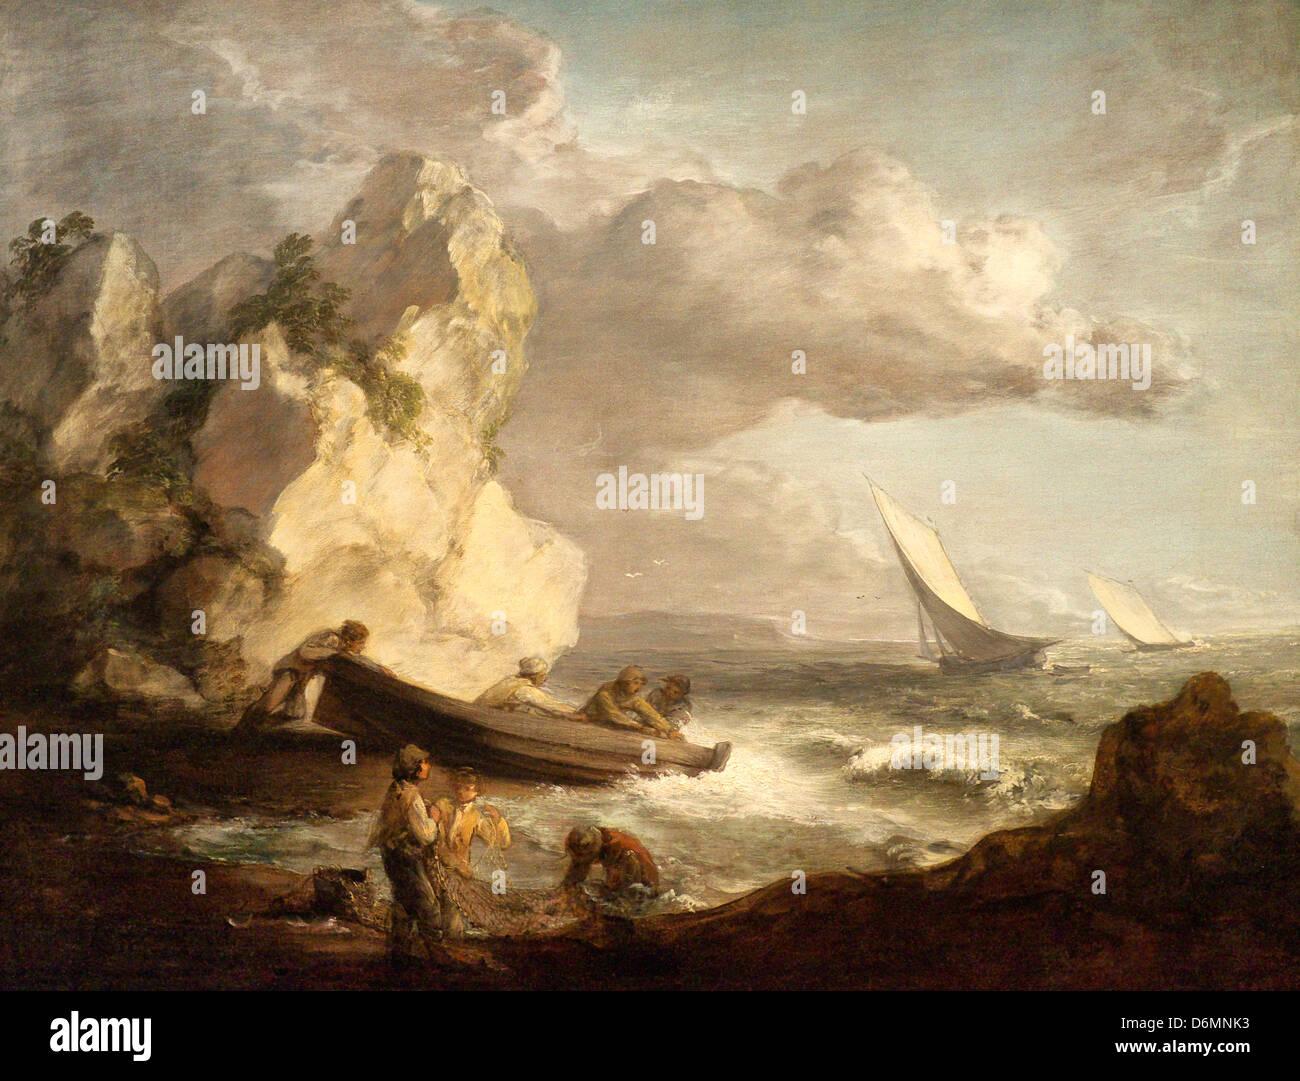 Seashore with Fishermen by Thomas Gainsborough - Stock Image